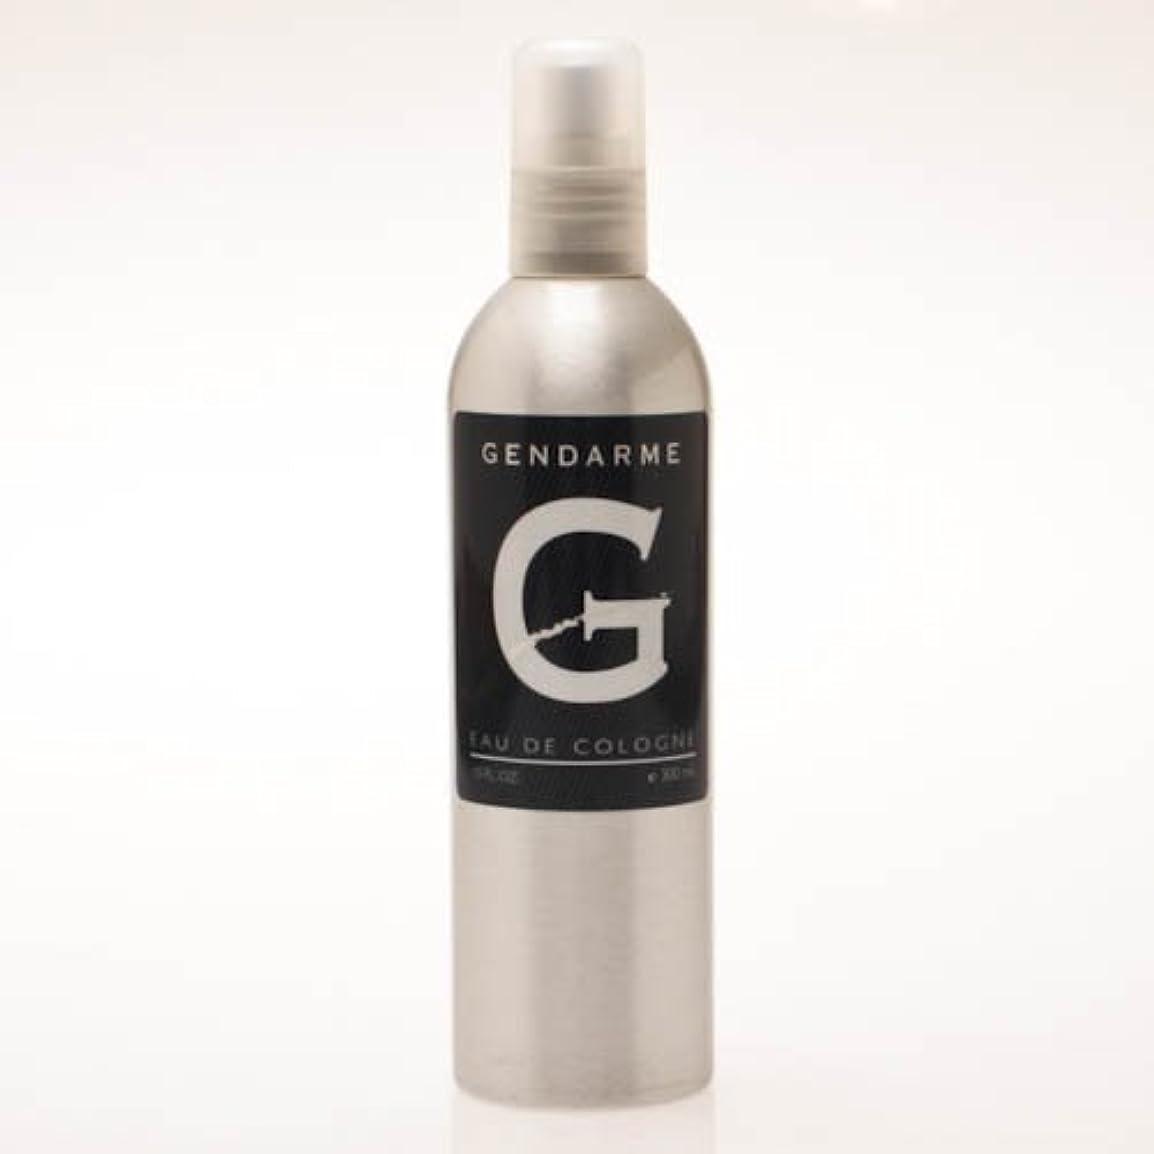 Gendarme (ゲンダーム) 10.0 oz (300ml) Cologne Spray Recharge for Men